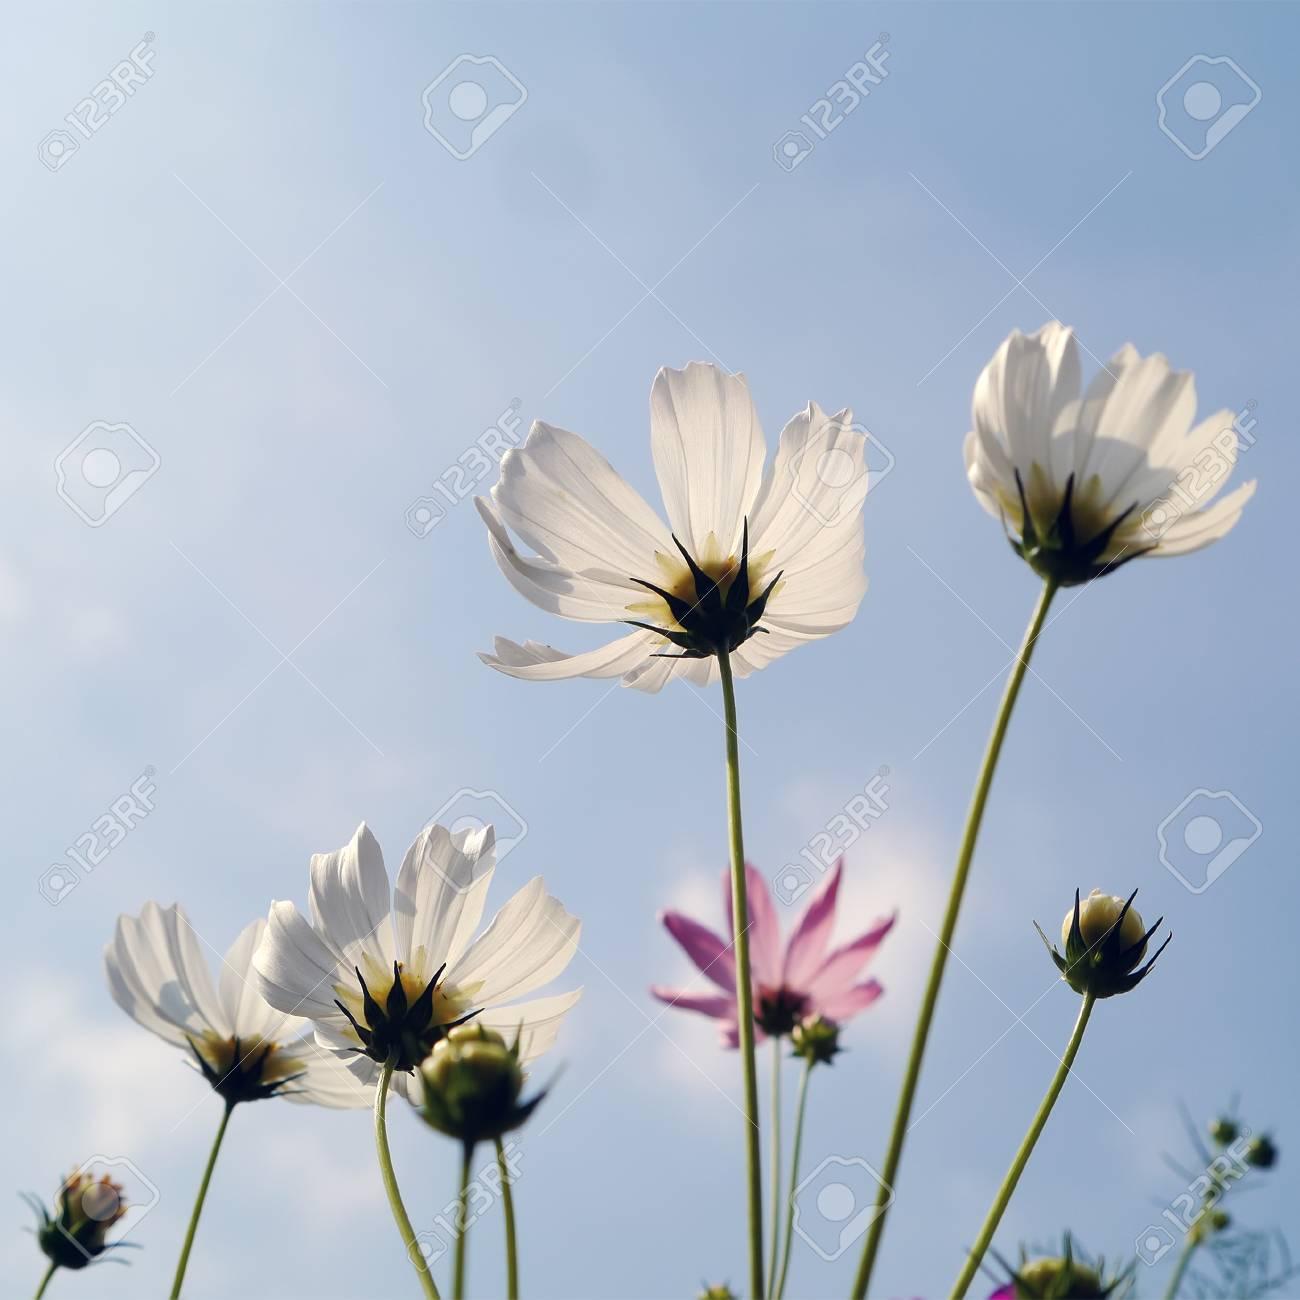 White cosmos flowers in garden stock photo picture and royalty stock photo white cosmos flowers in garden mightylinksfo